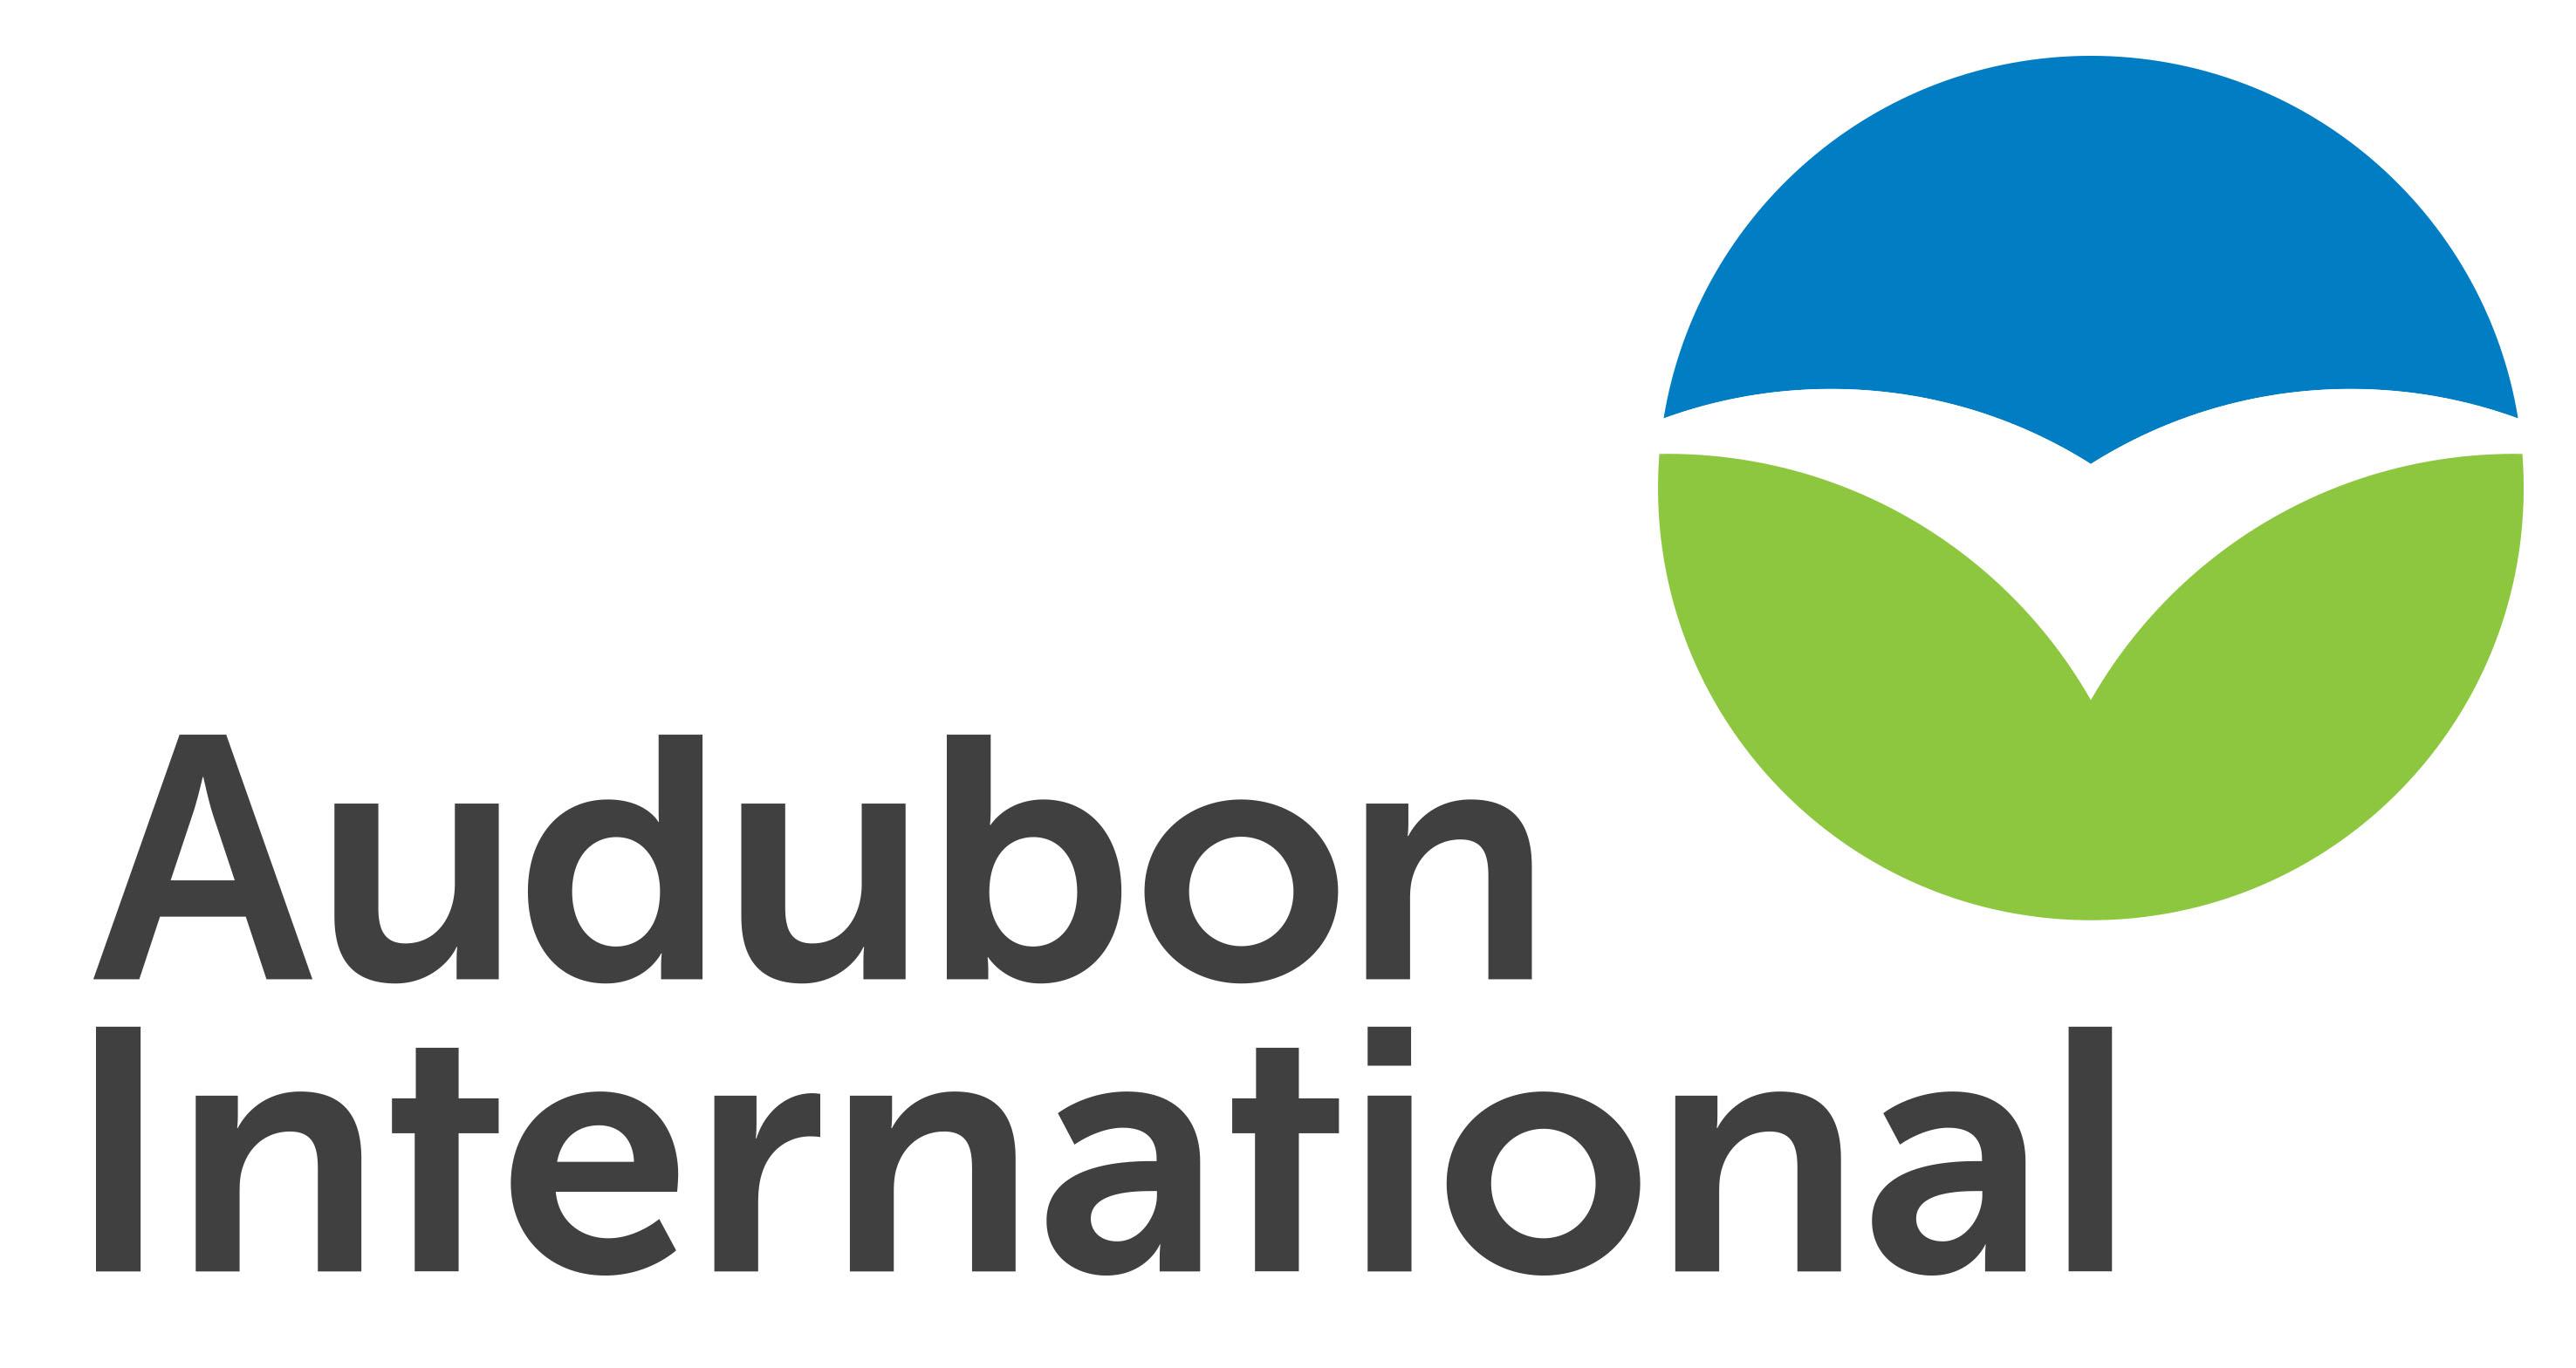 Audubon International